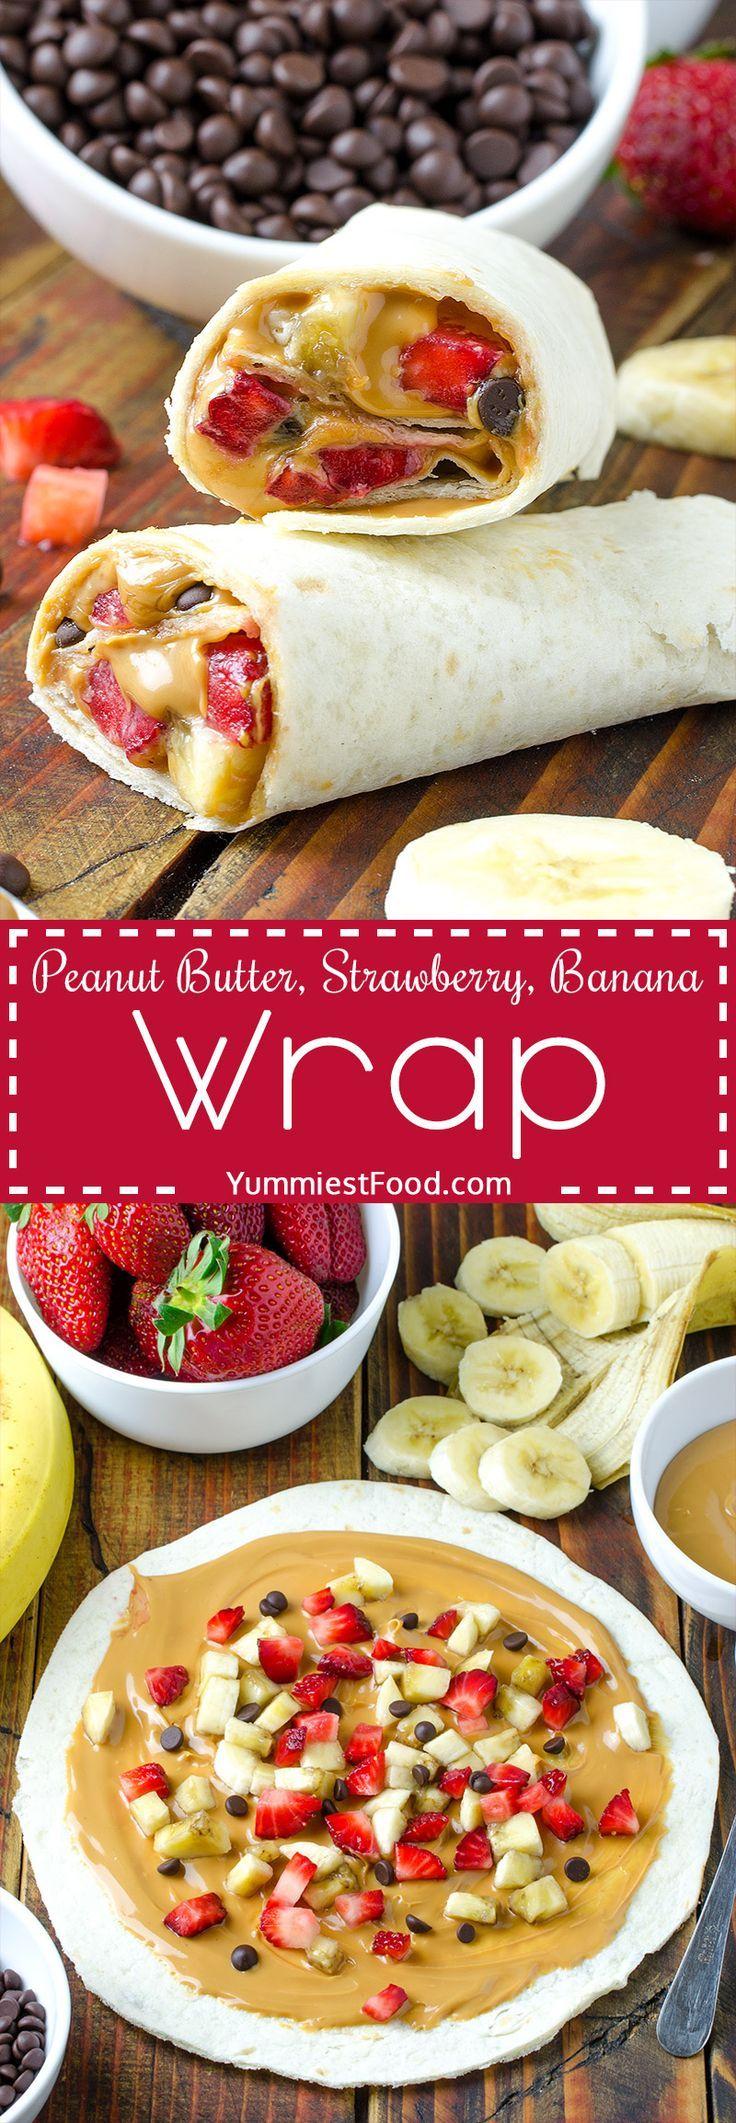 Healthy Peanut Butter, Strawberry, Banana Wrap Sydney Maynard